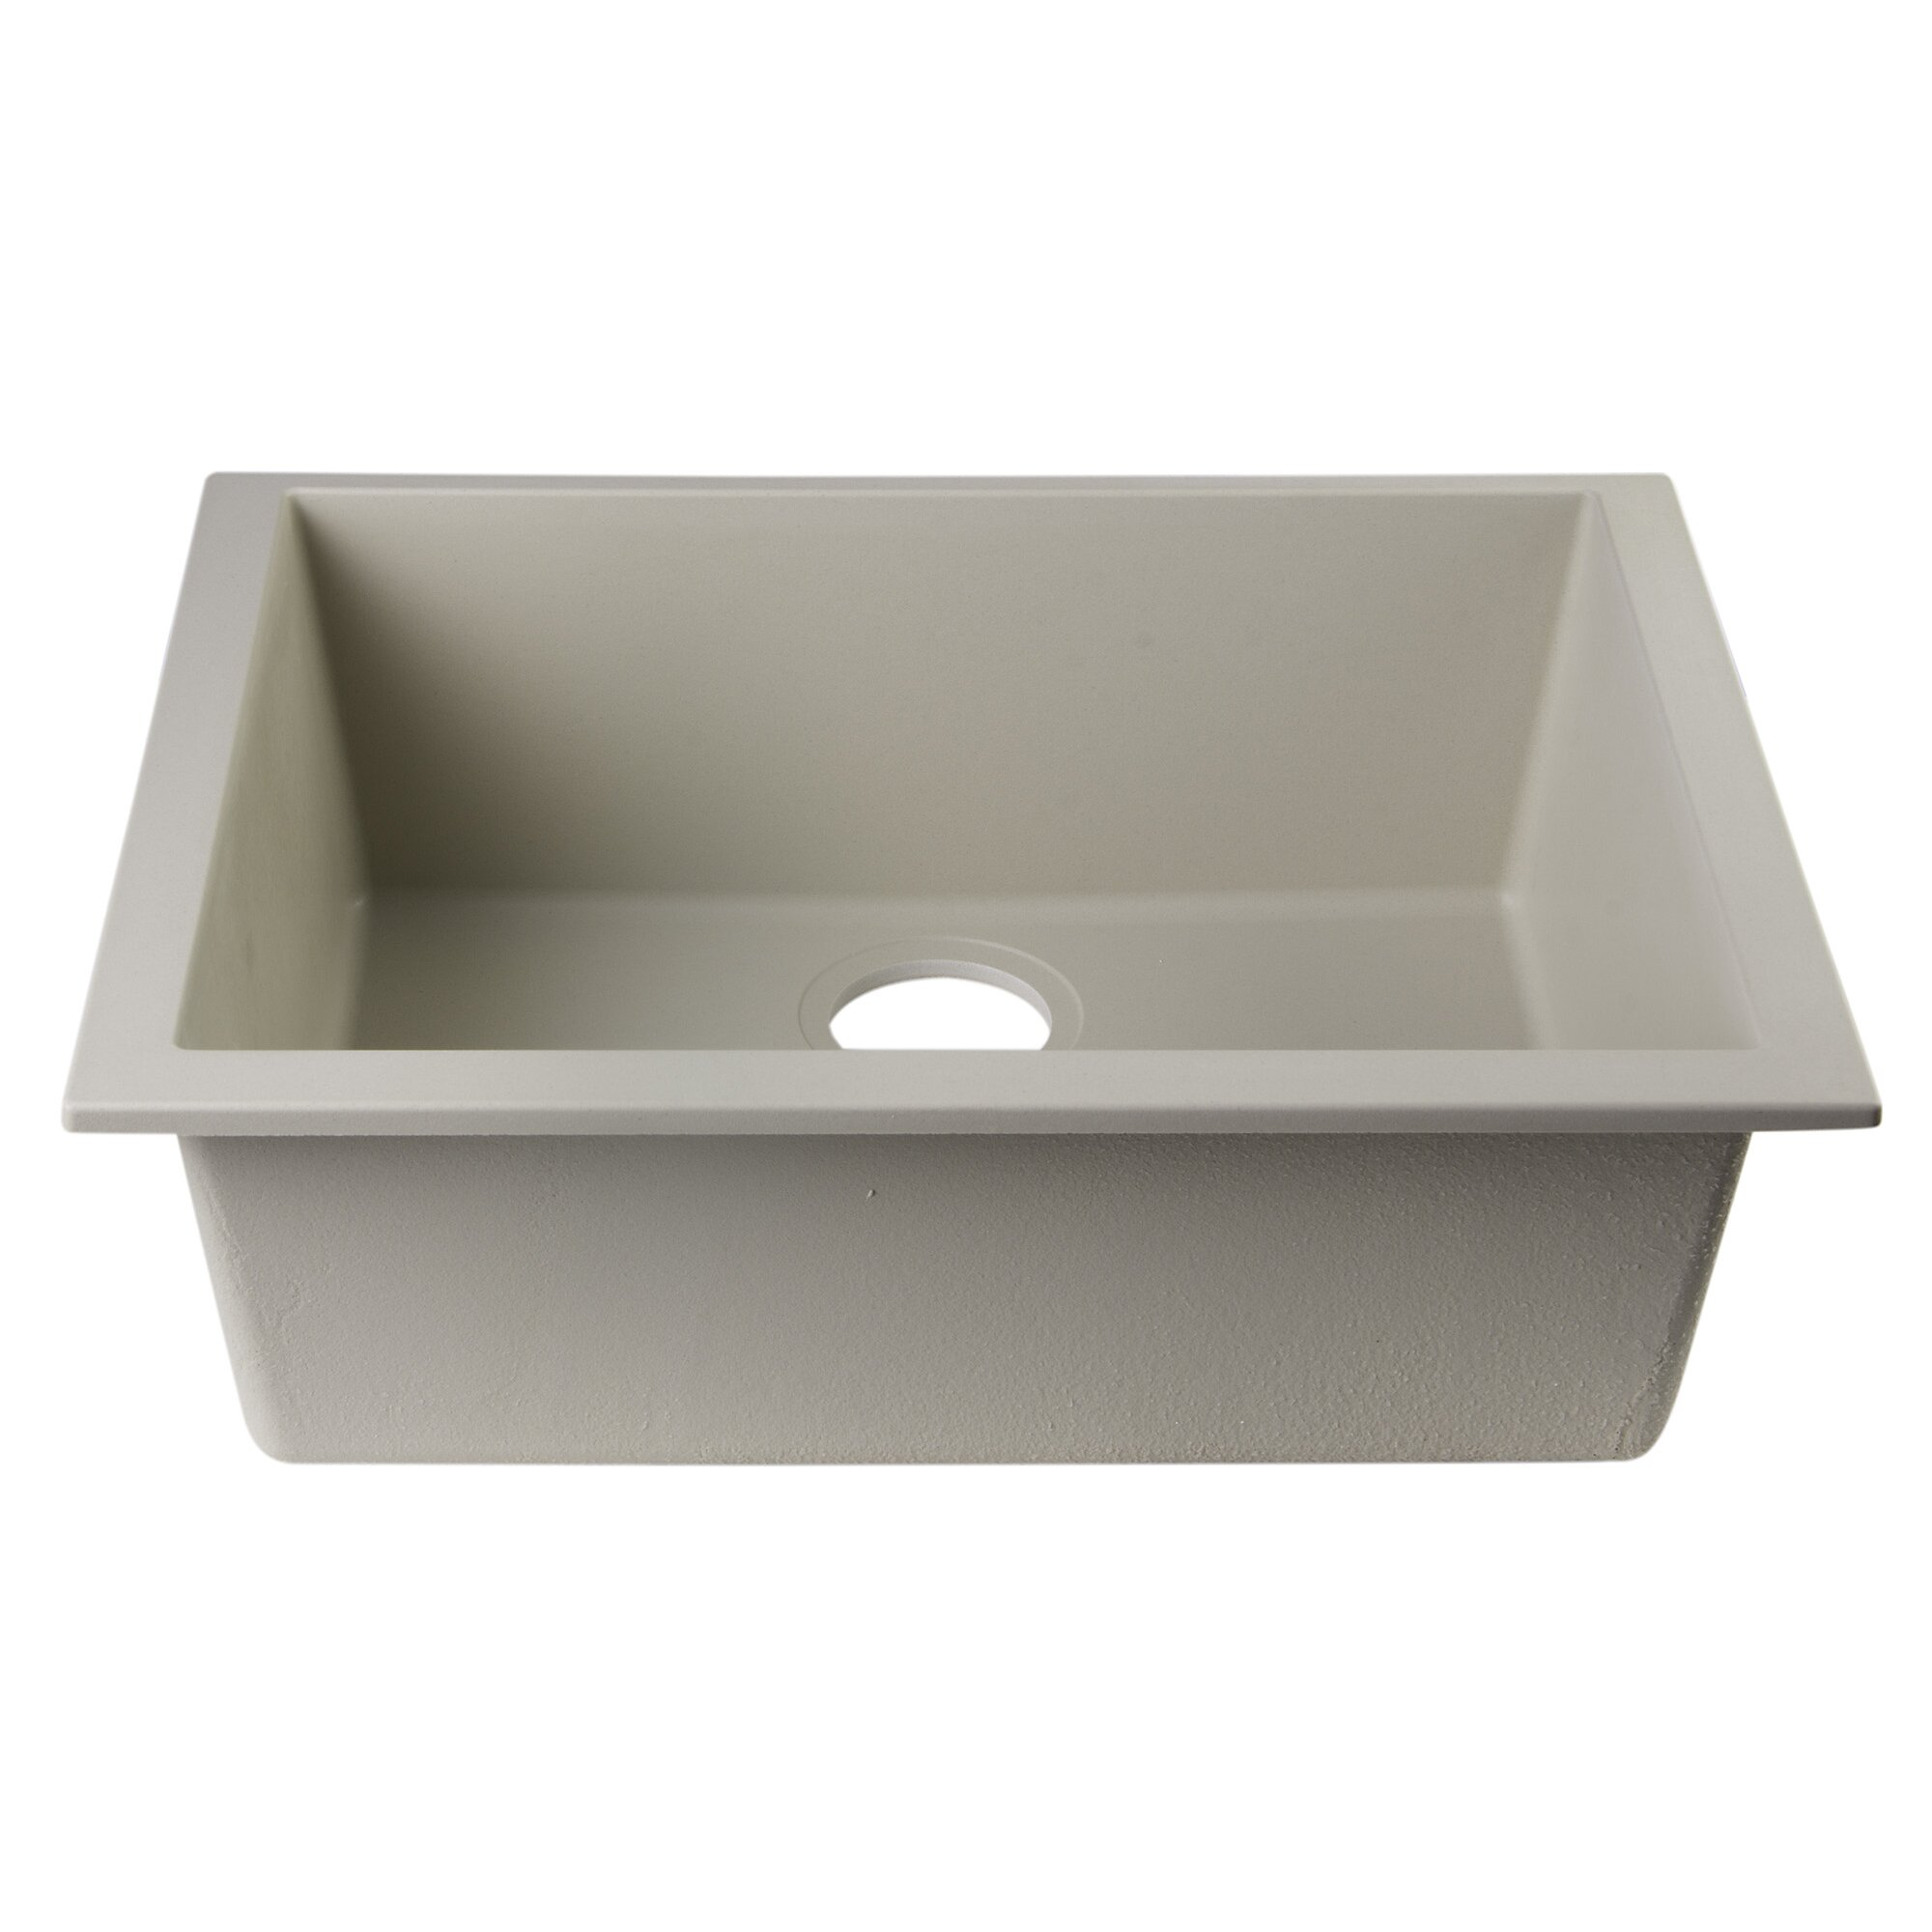 "Alfi Brand 23.63"" X 17.75"" Undermount Single Bowl Kitchen"